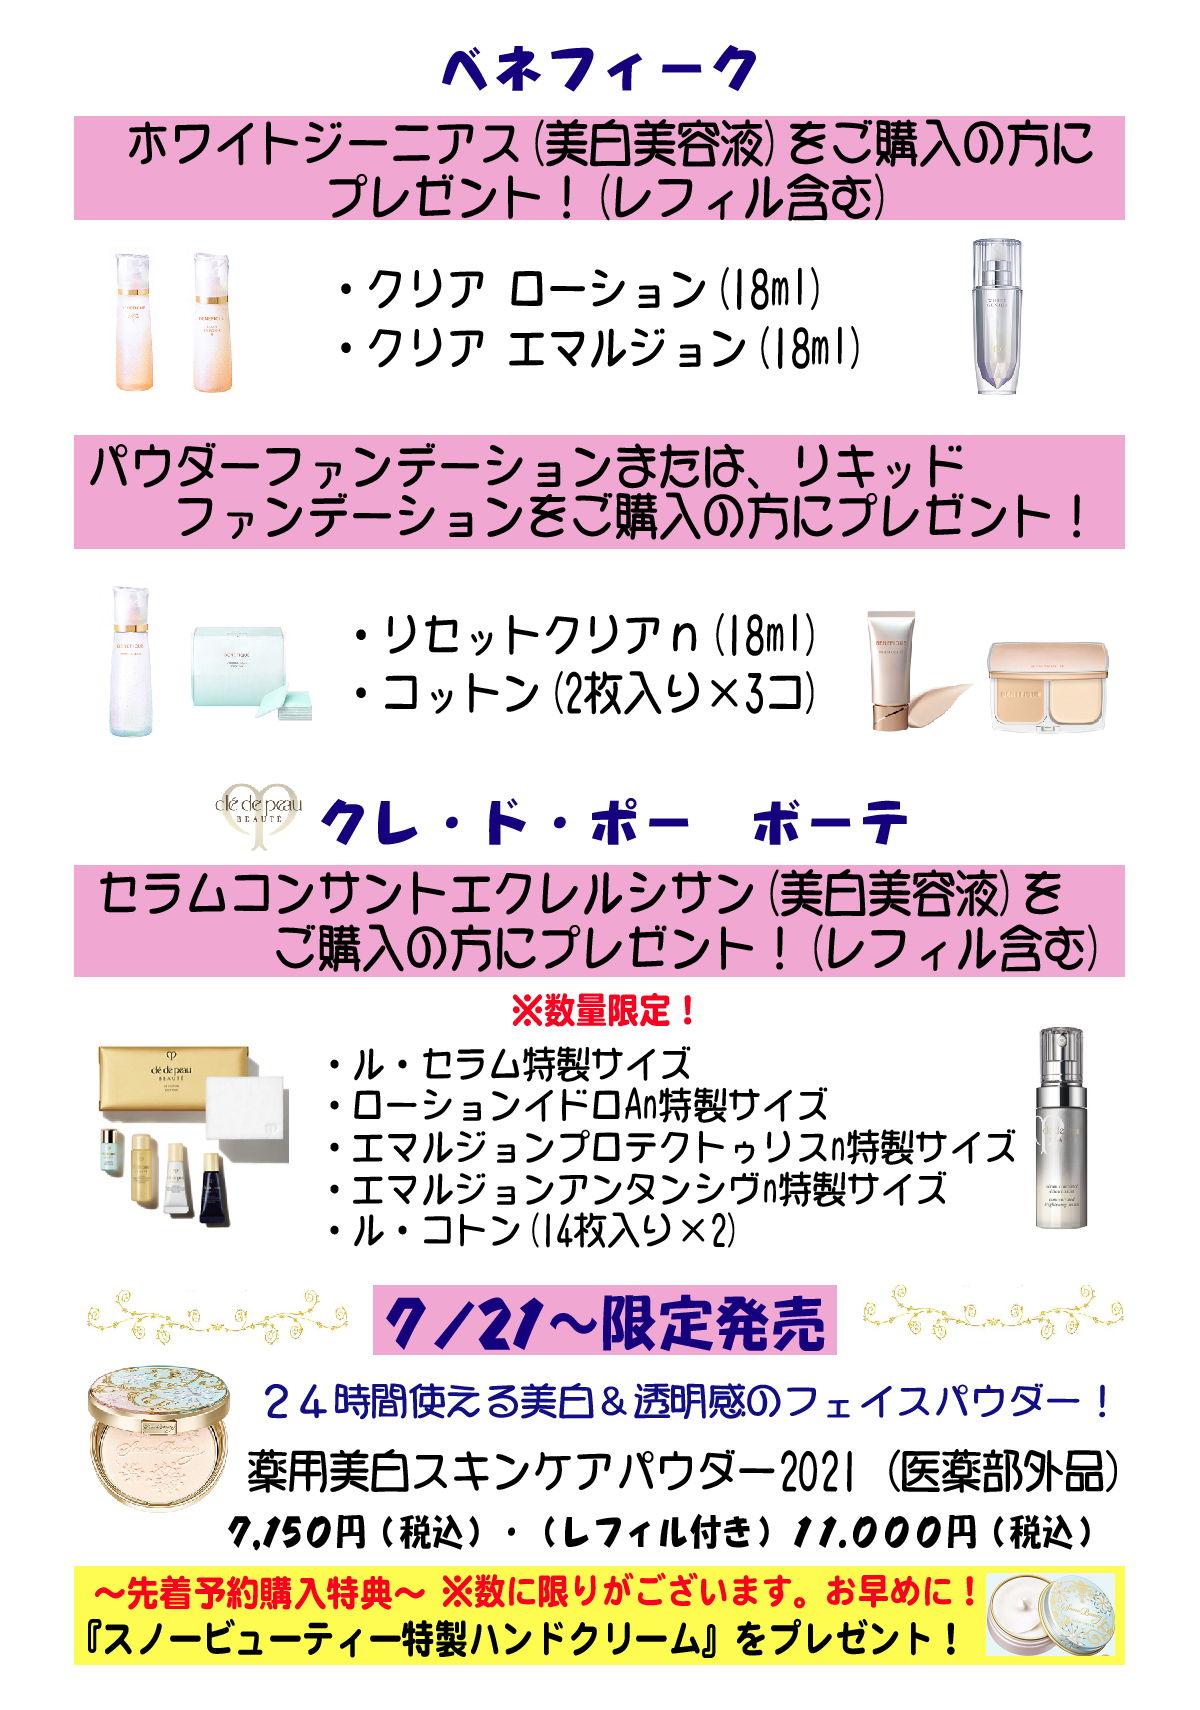 shiseido_20210520_02